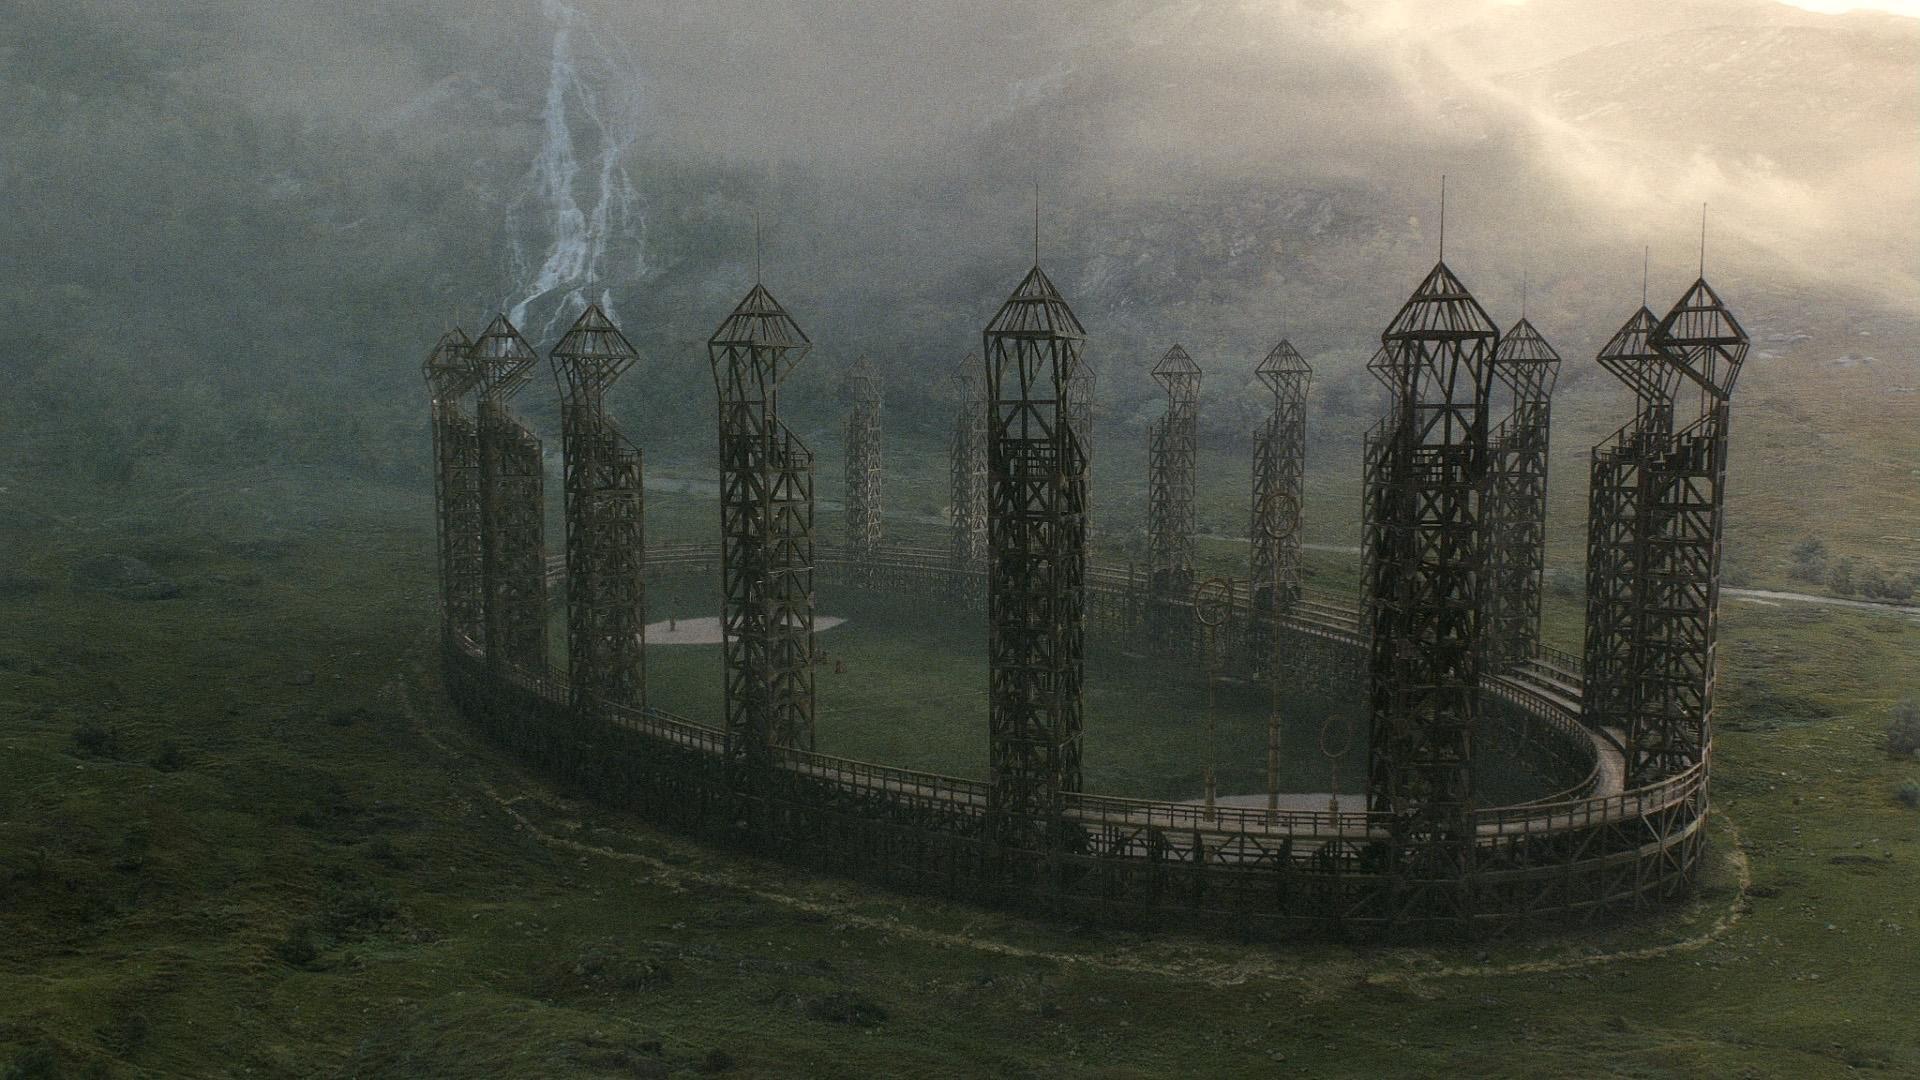 harry-potter-quidditch-paper-pitch-house-prince-blood-destroyer-stills.jpg…  | Hogwarts | Pinterest | Harry potter wallpaper, Harry potter and Hogwarts